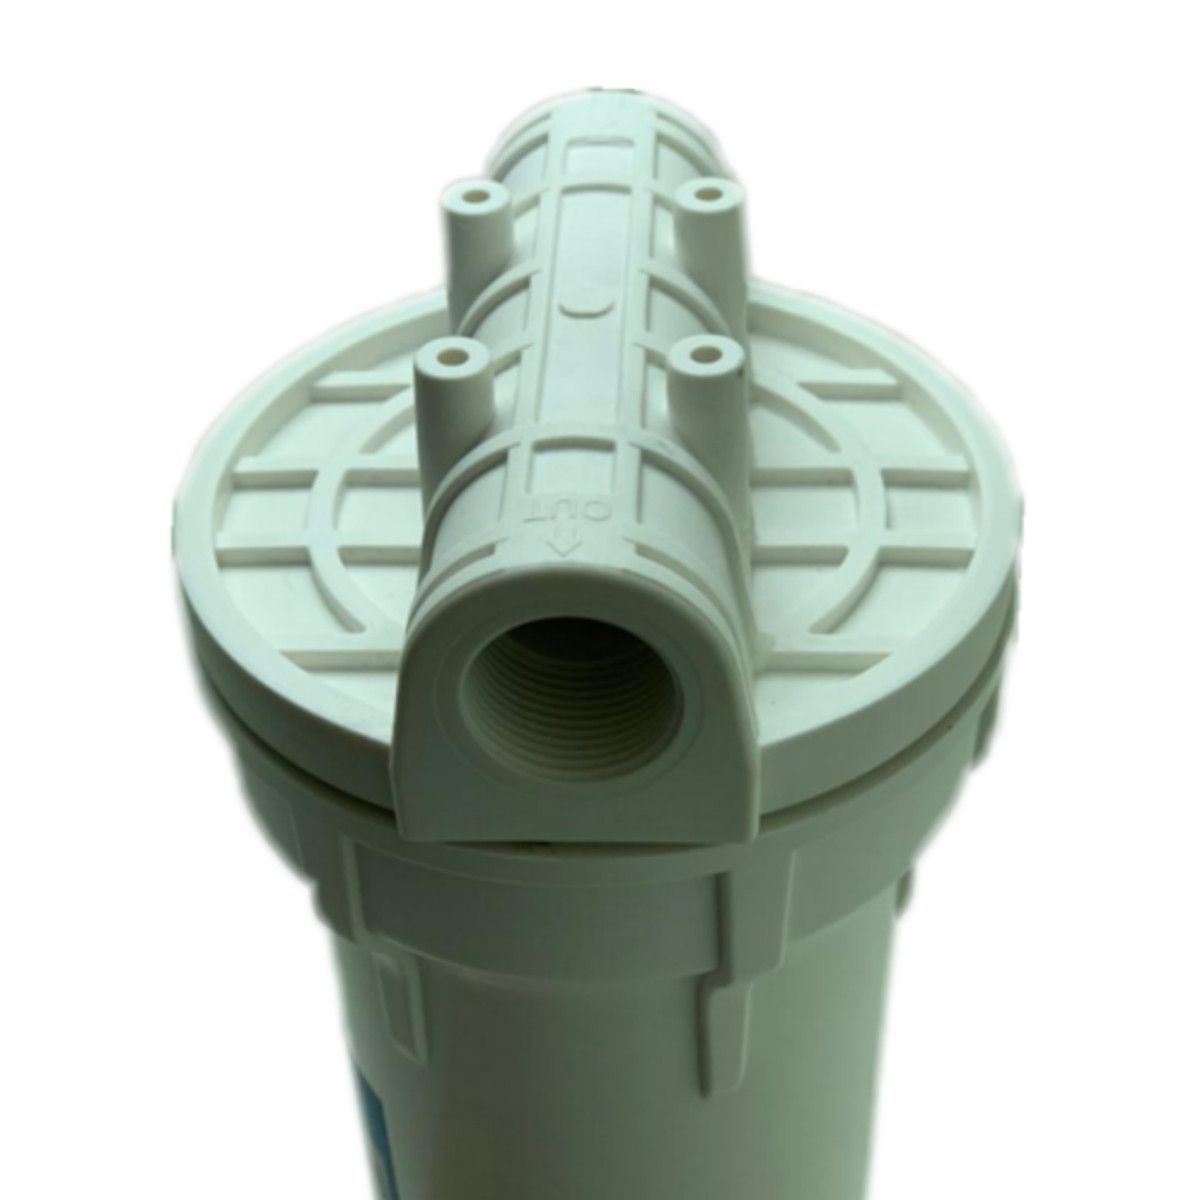 Filtro Água P/ Caixa Dágua 9 Ou Cavalete De Entrada + Refil